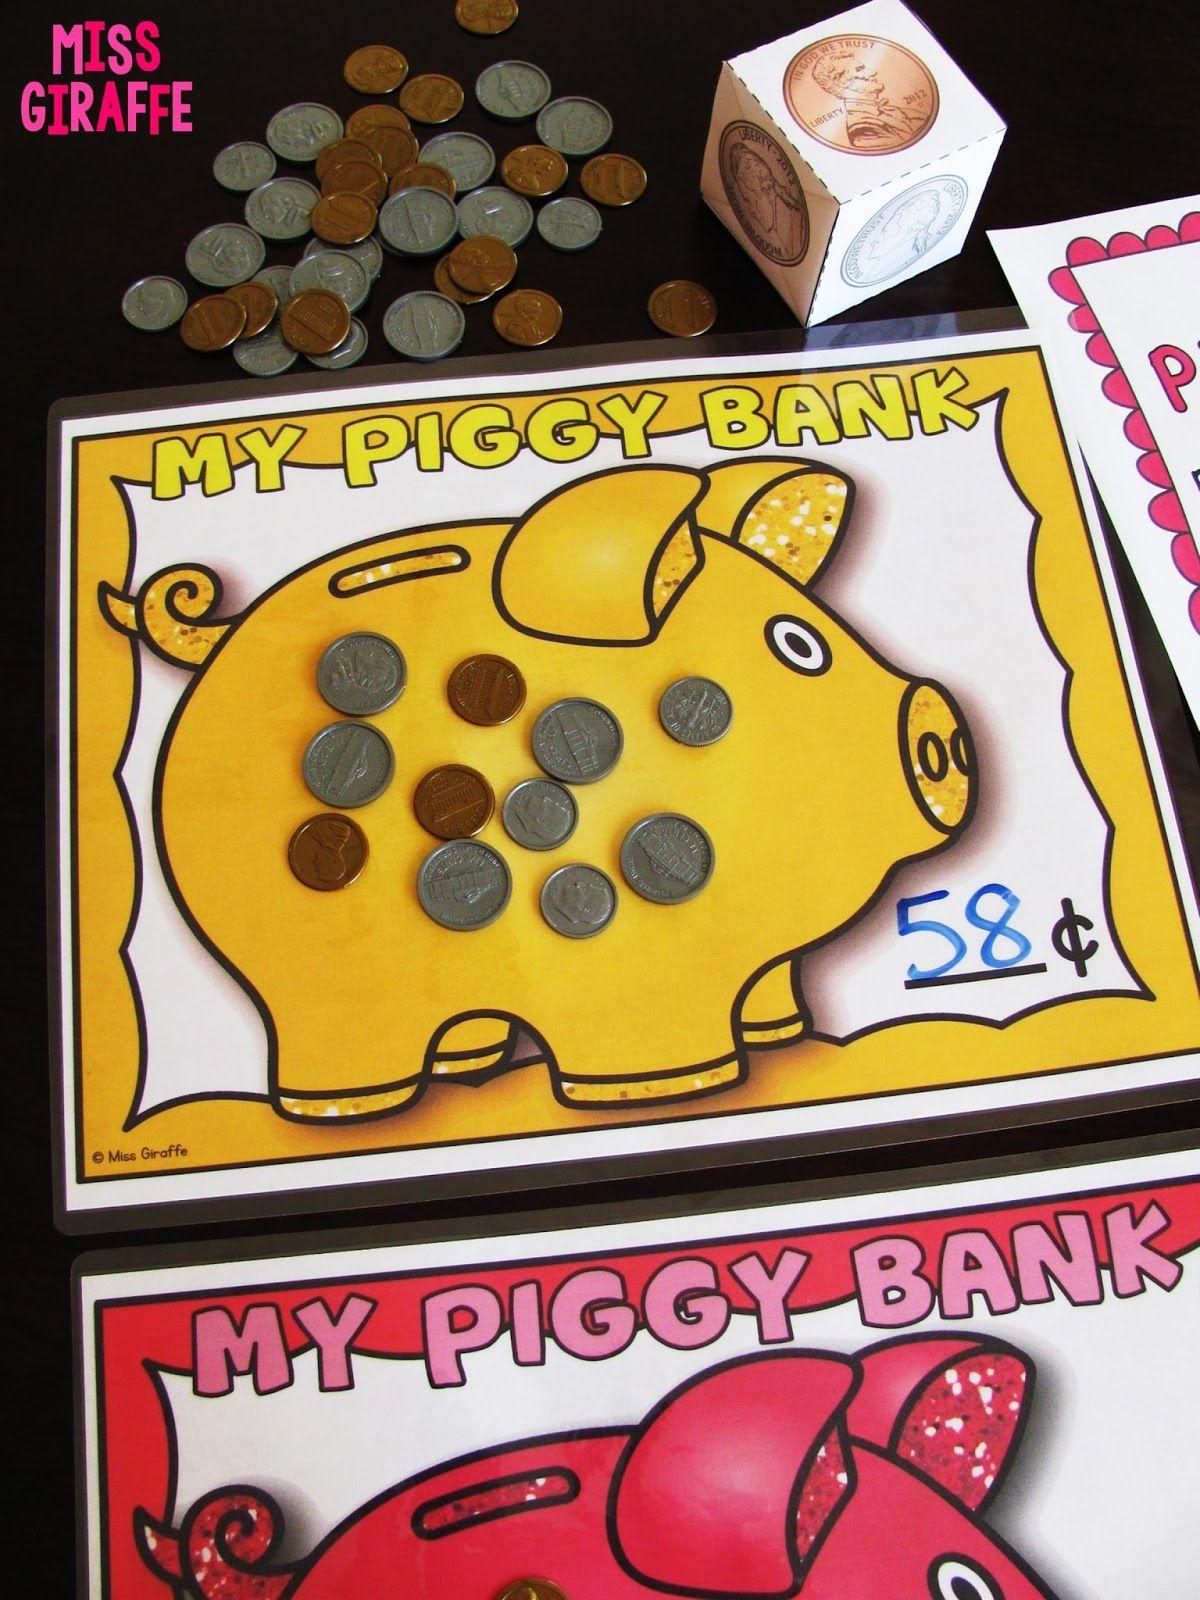 Adding Mixed Coins Center Piggy Banks 282 29 1 200